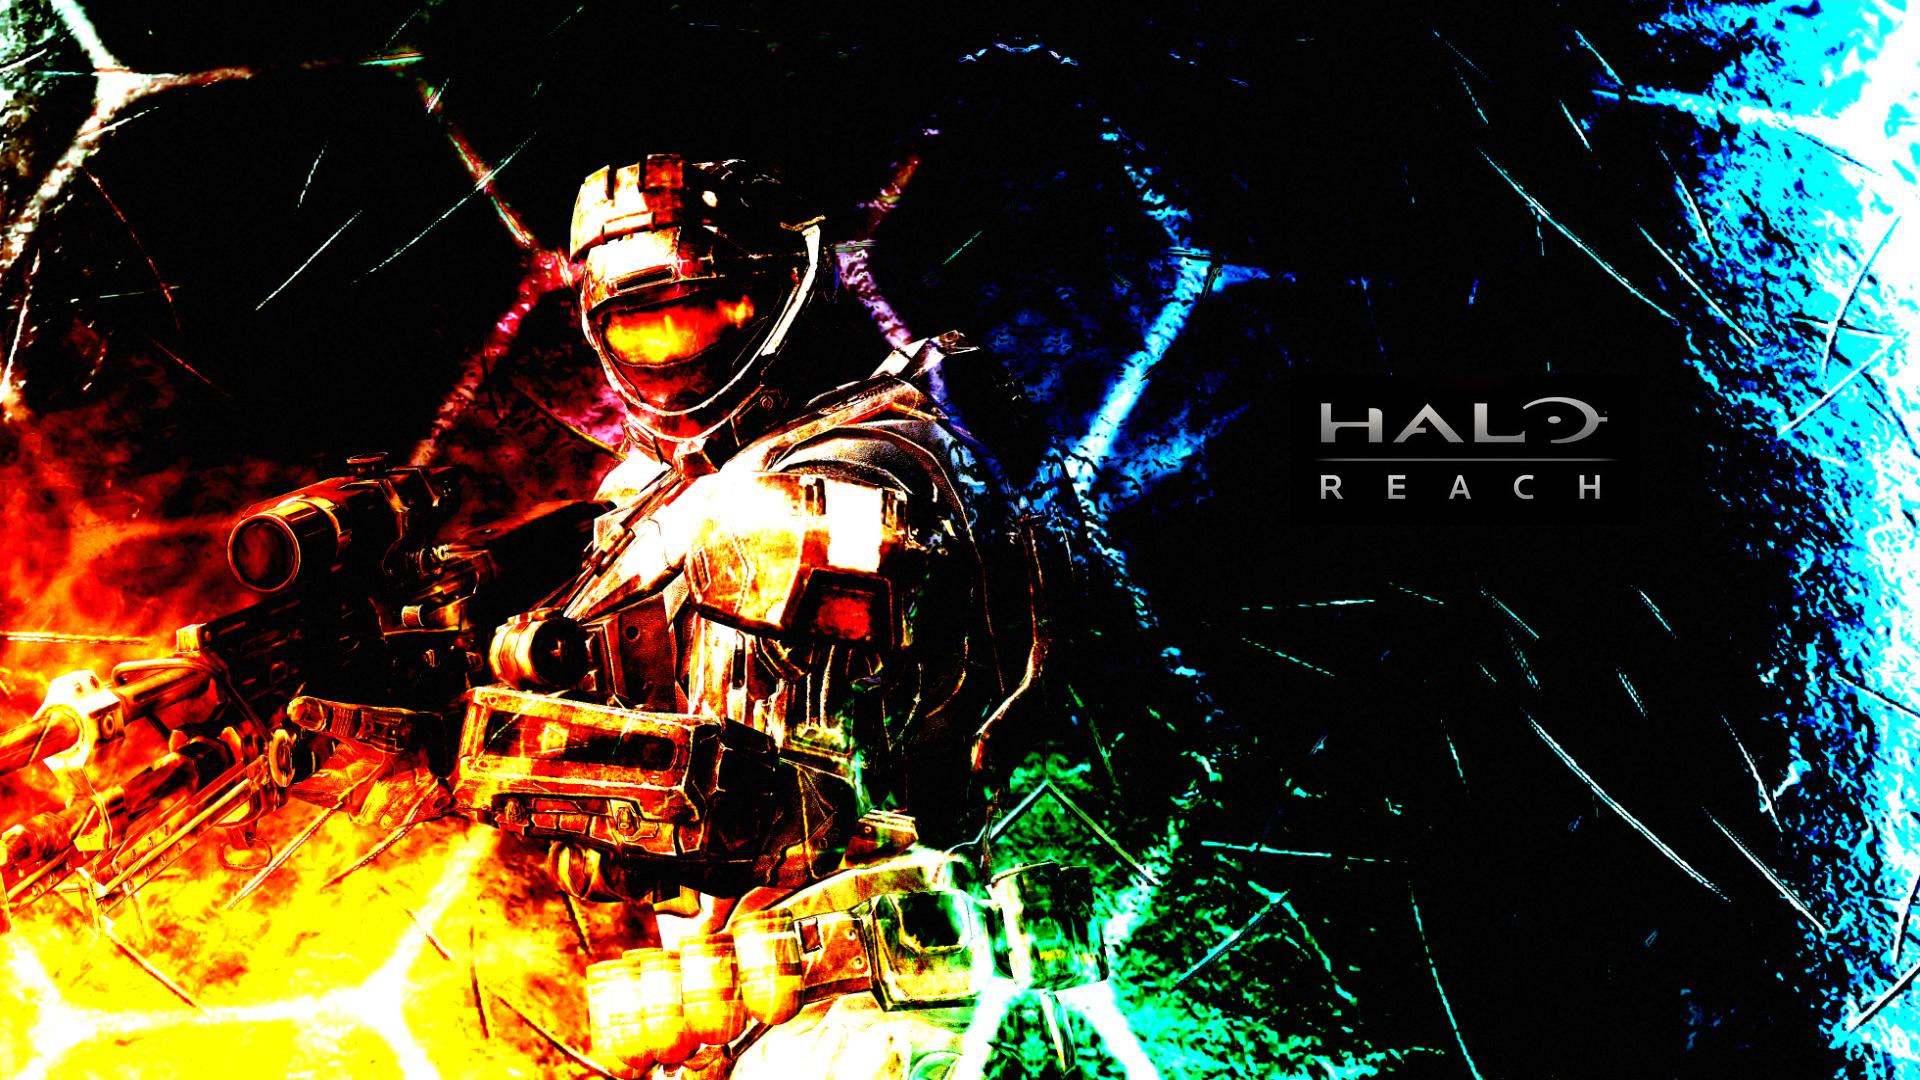 Halo Computer Wallpapers Desktop Backgrounds 1920x1080 ID125662 1920x1080